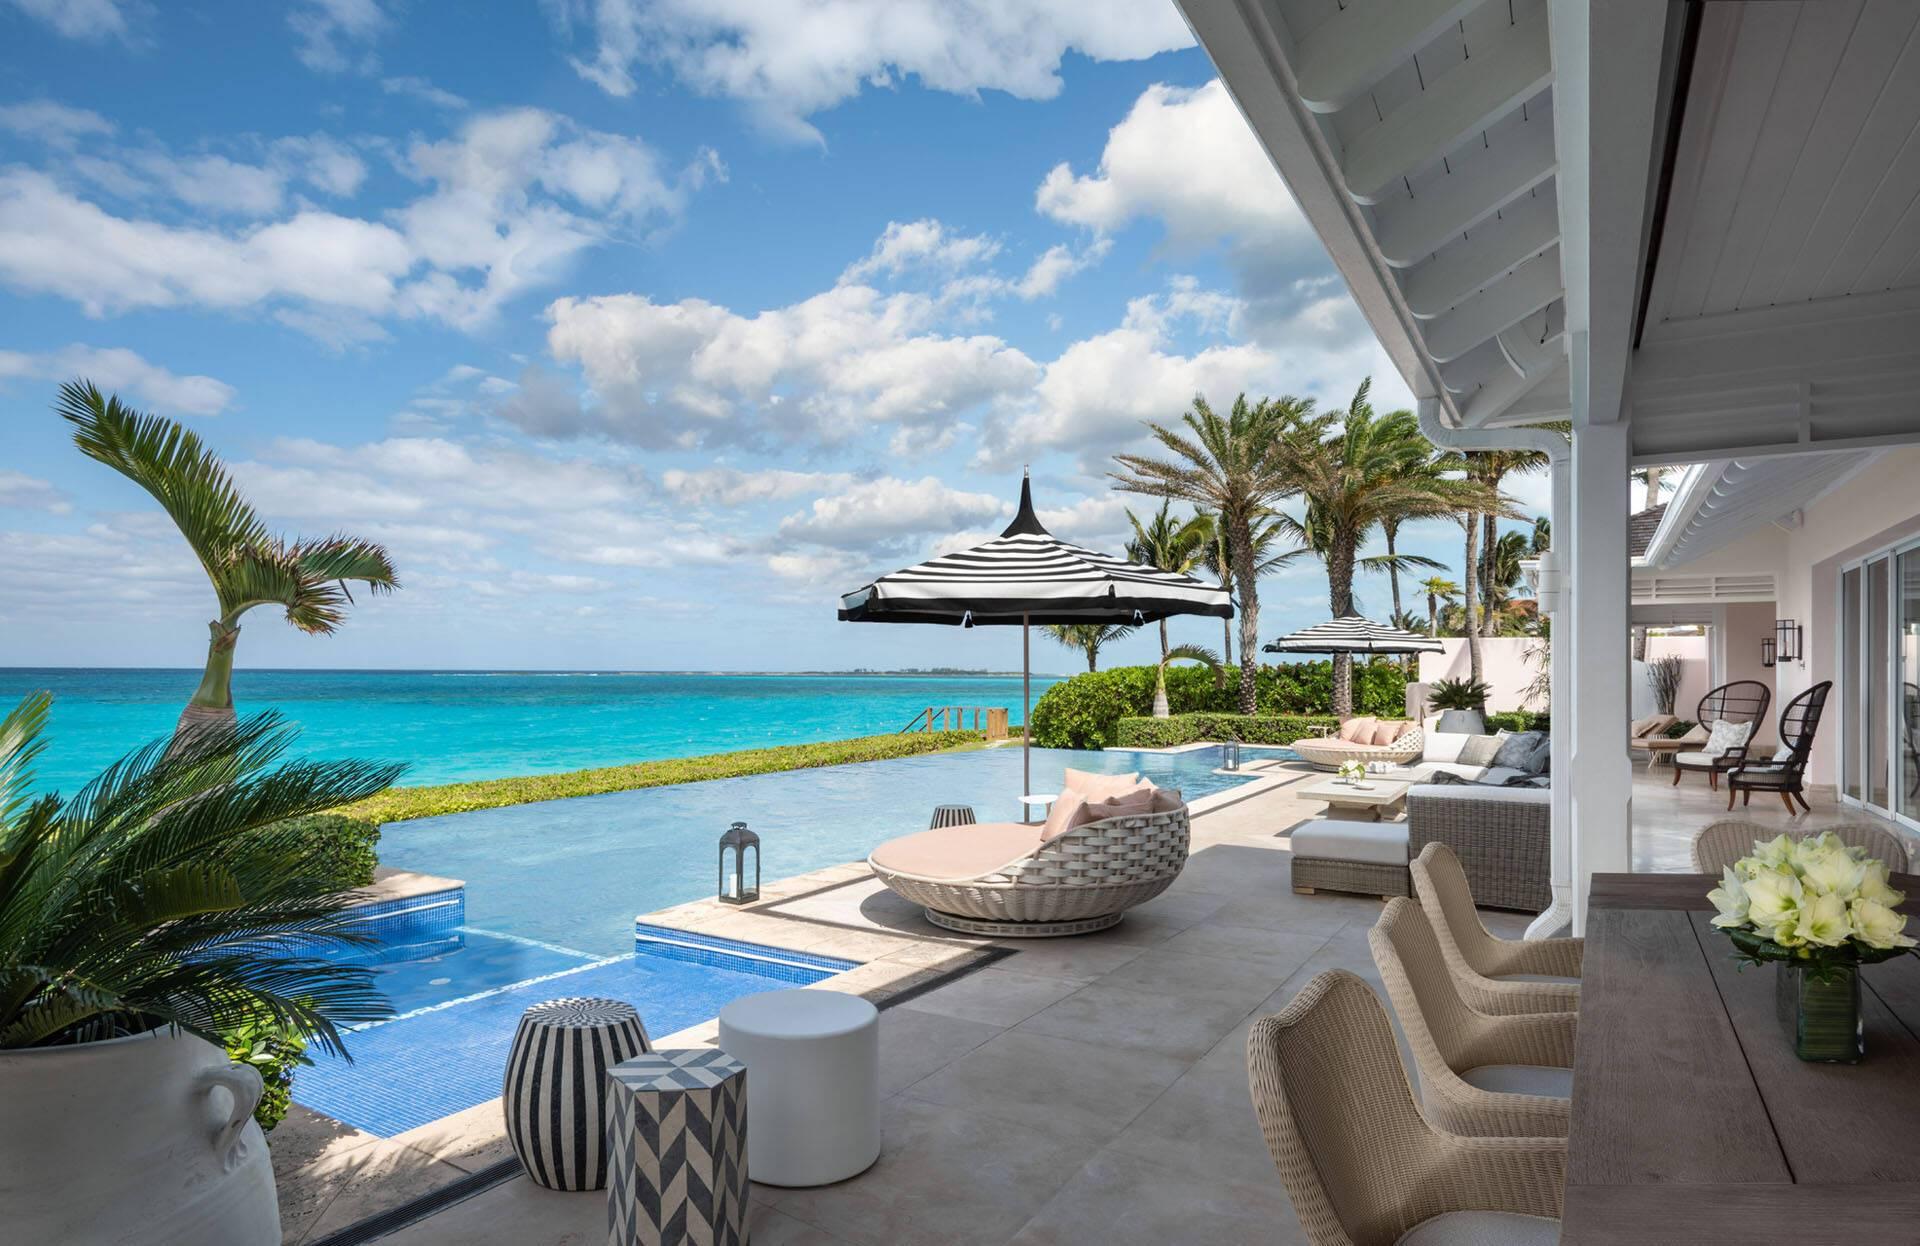 Ocean Club Four Seasons Bahamas Villa Residence Piscine